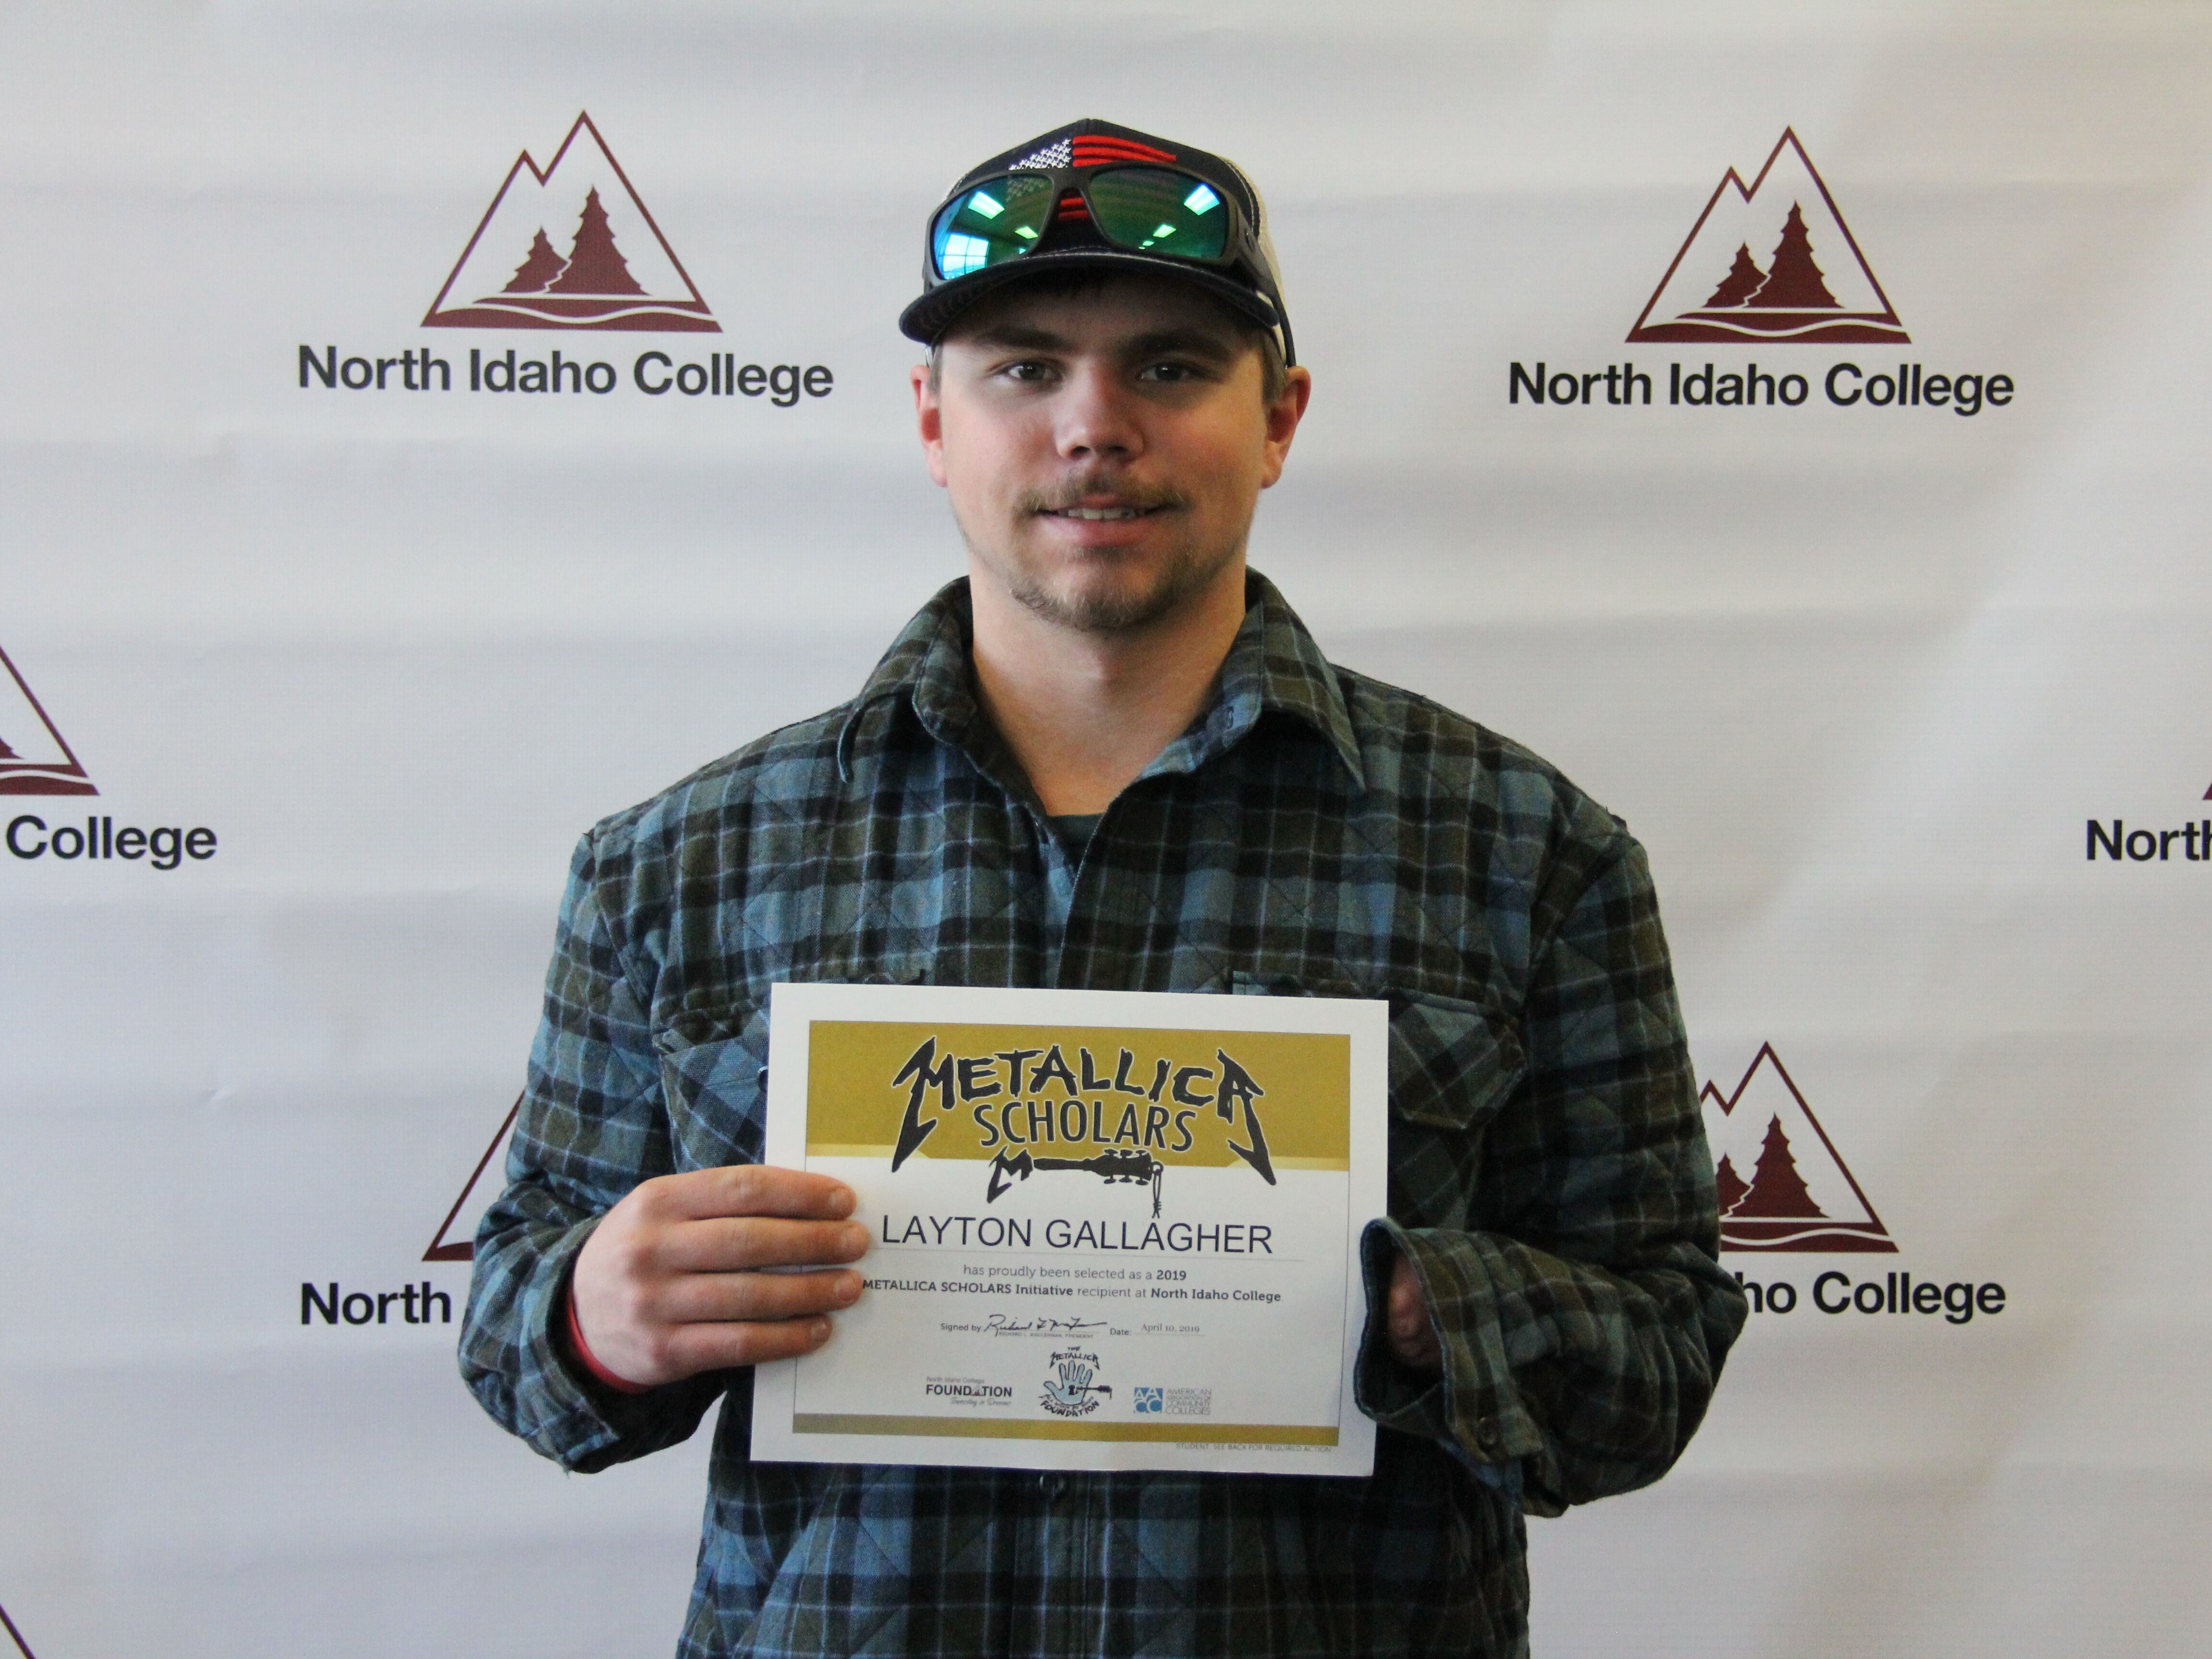 Layton - North Idaho College